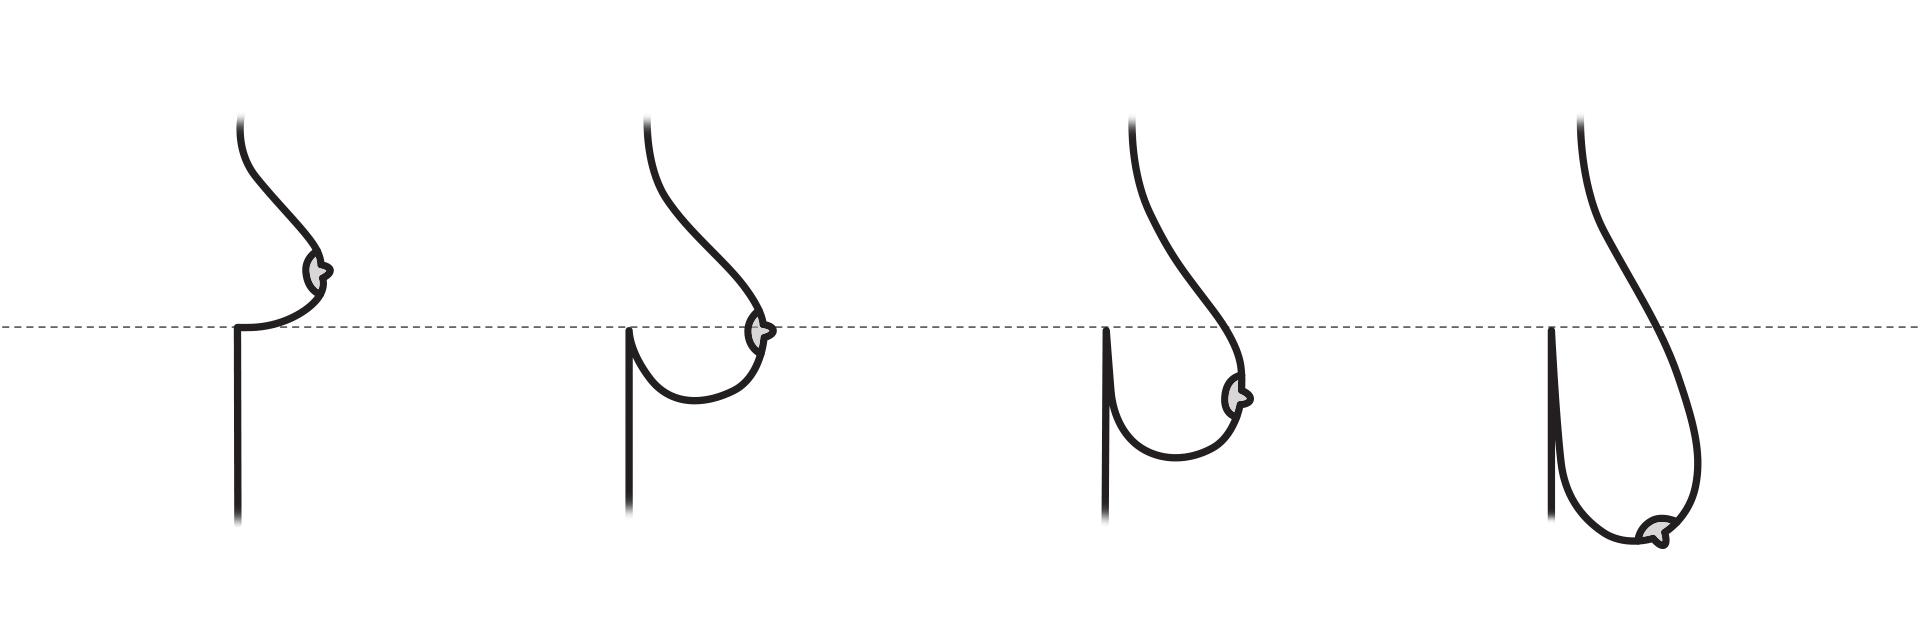 Провисание груди